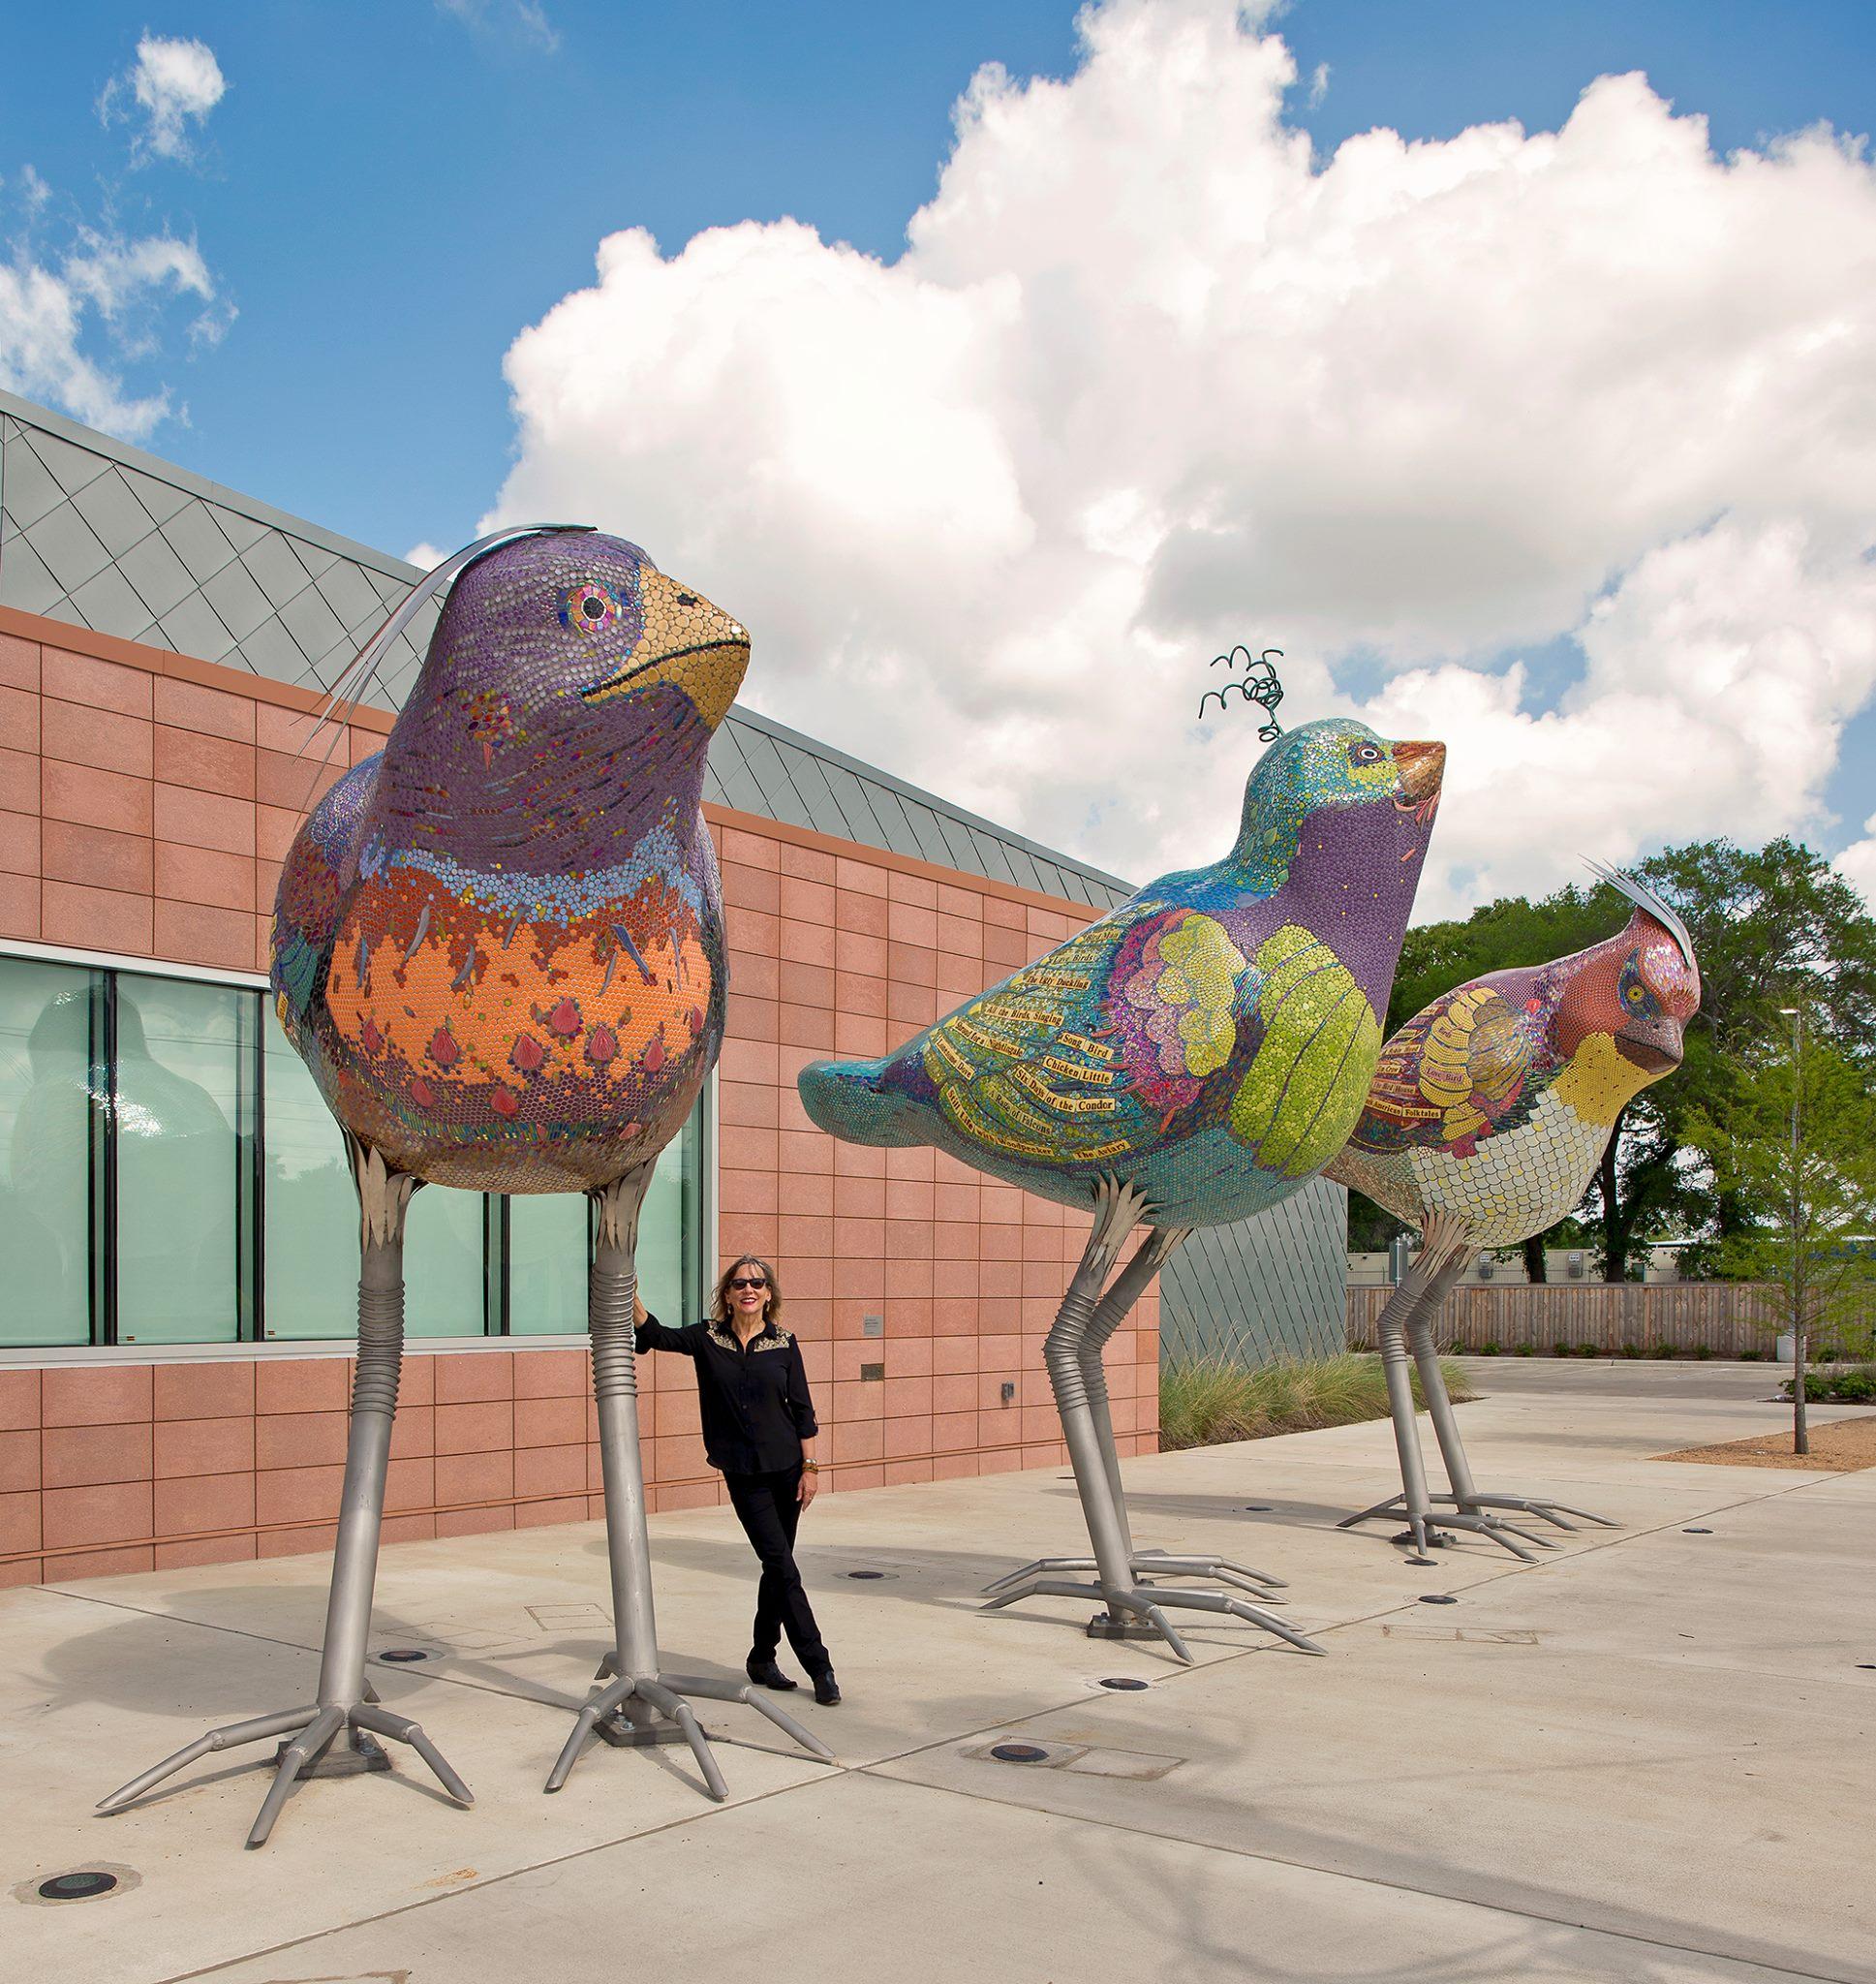 Hall-Dixie+Birds-dfg copy 2.jpg